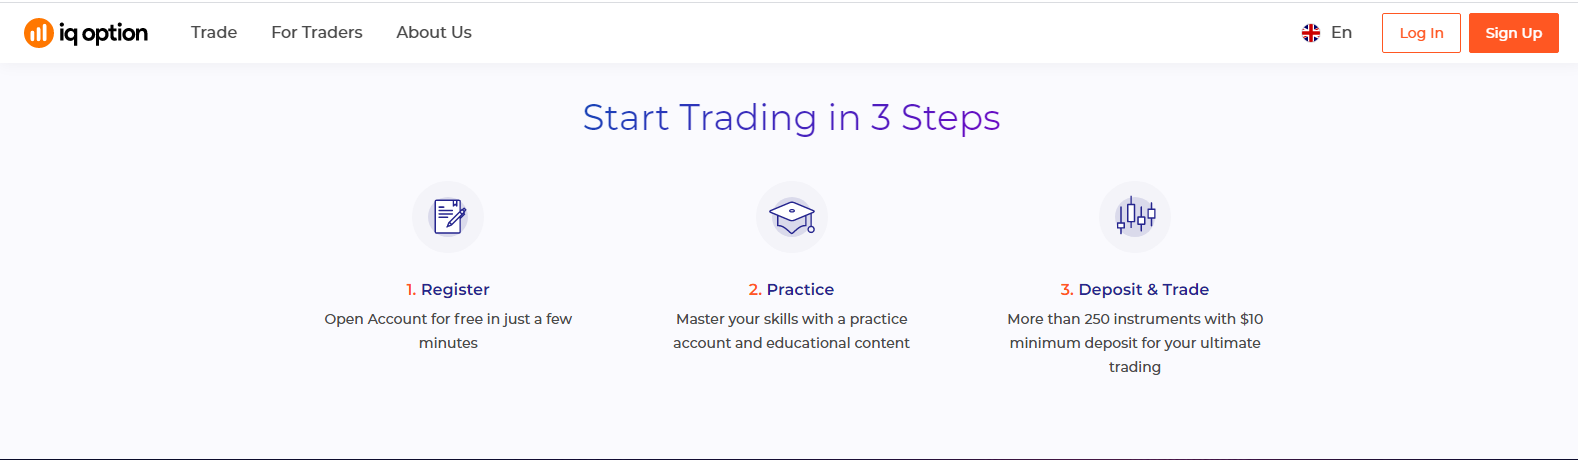 Review IQ Option – Trading Process